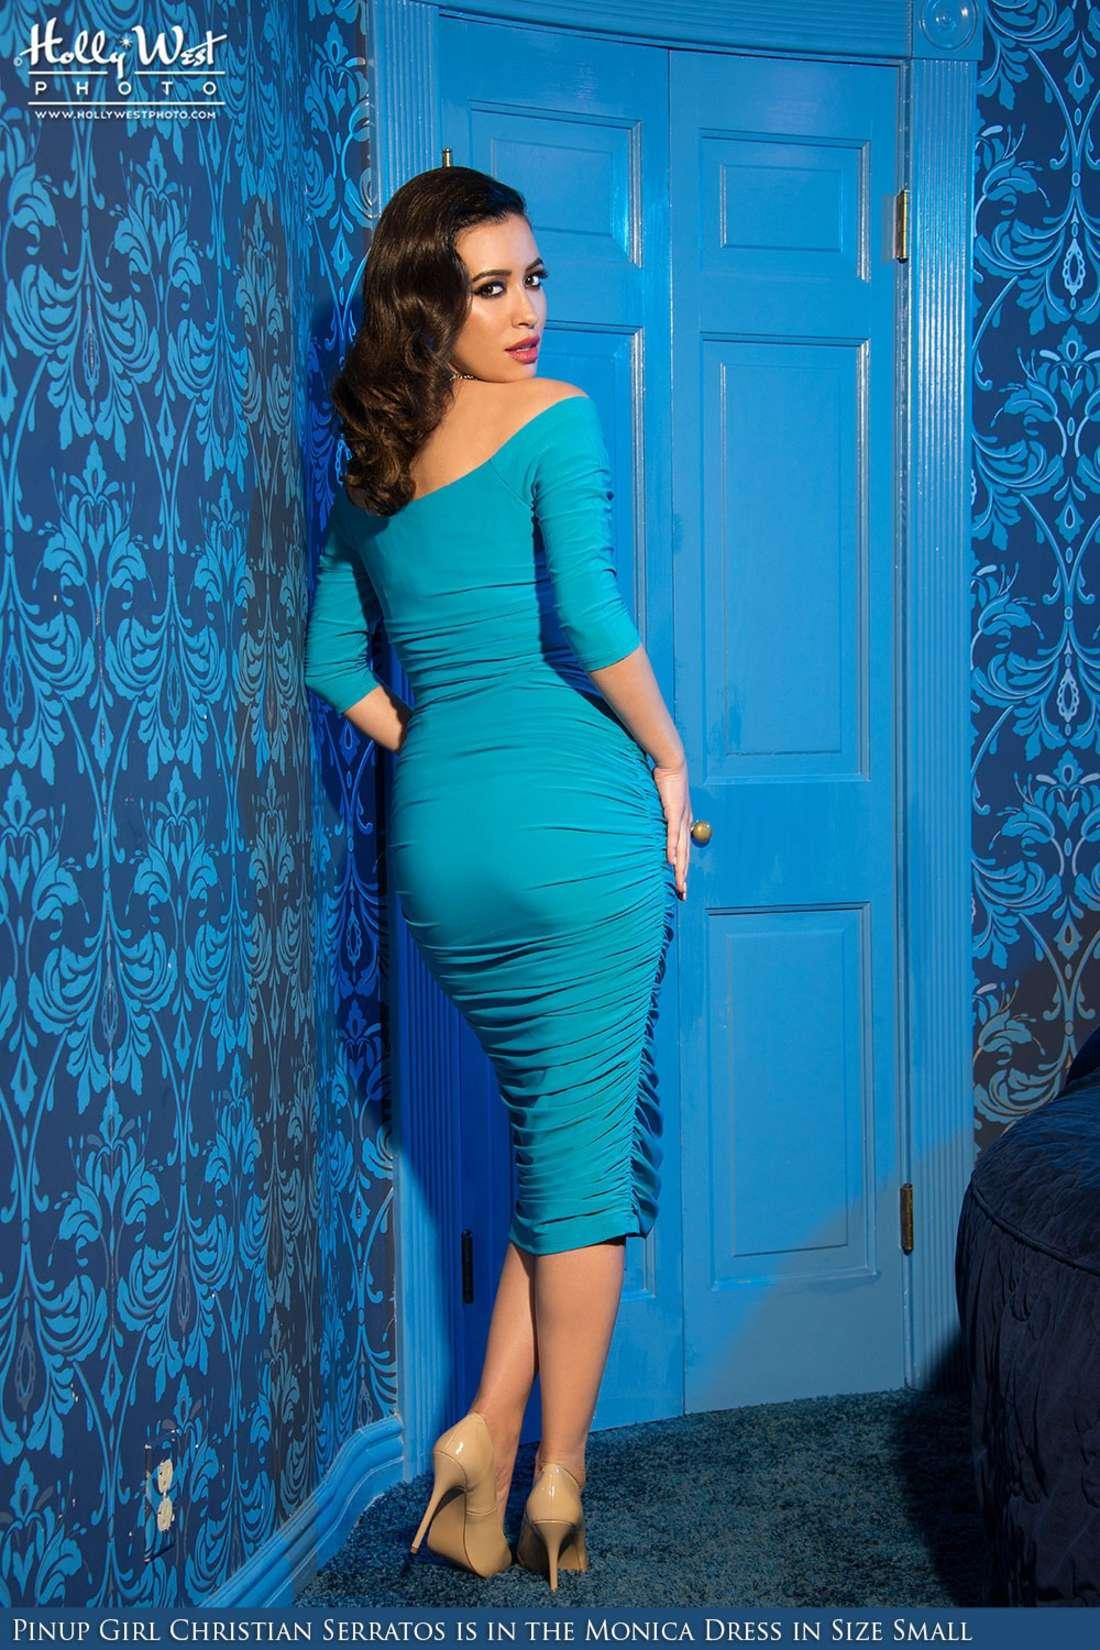 Christian Serratos Pinup Girl Clothing by Lori Anne